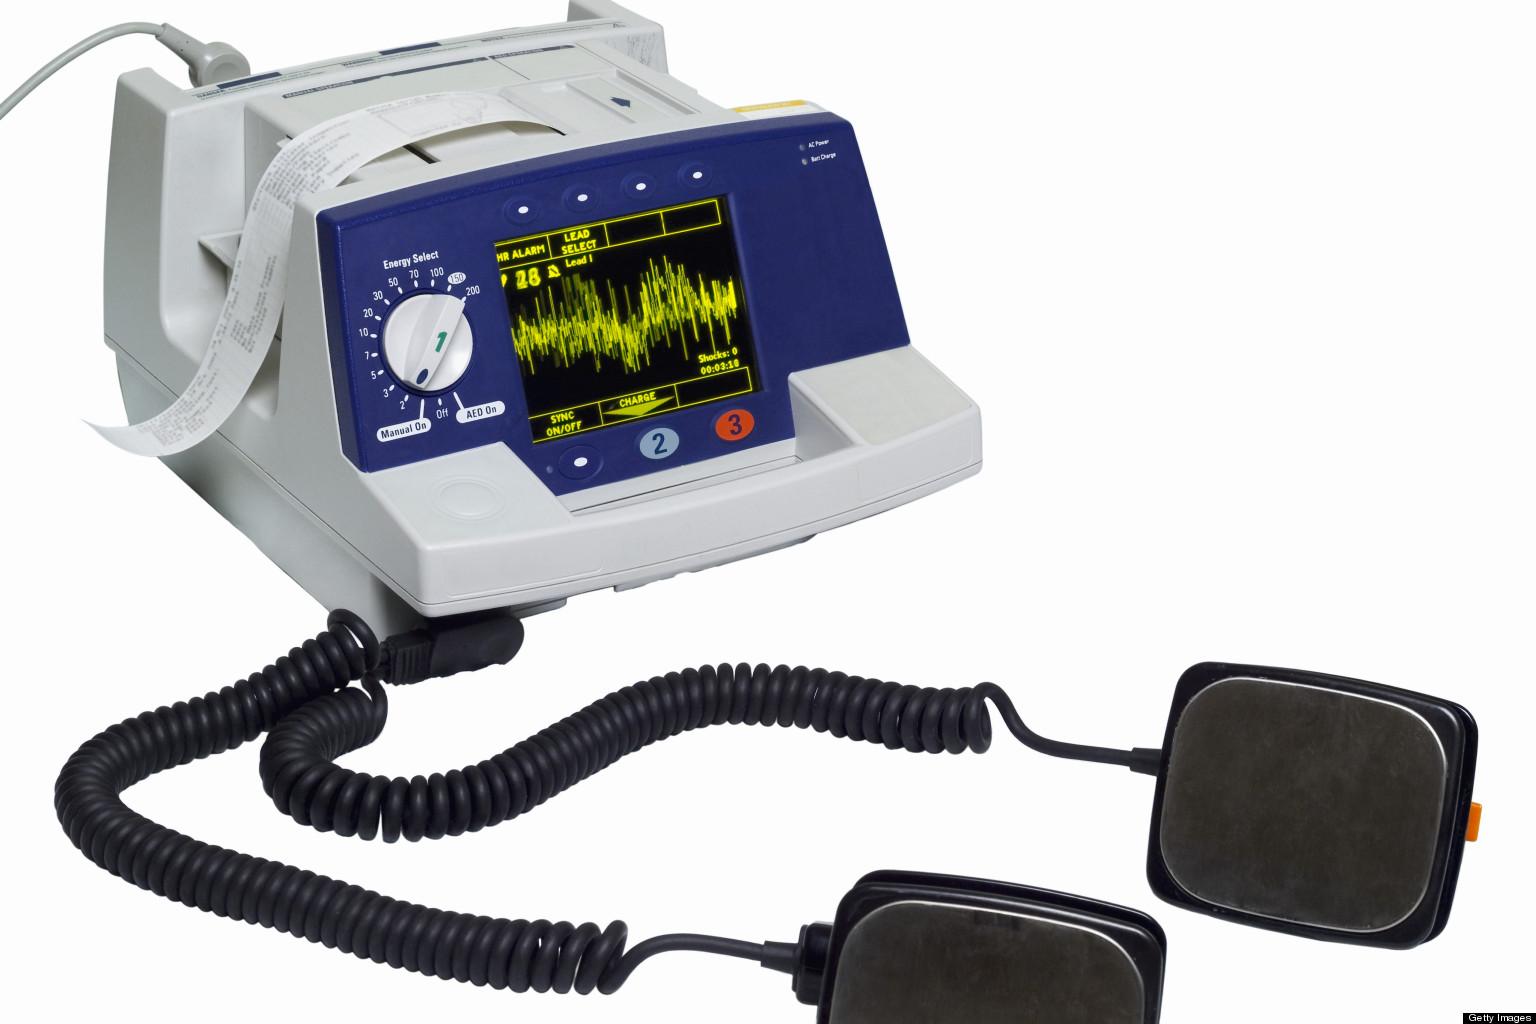 Medical Equipment Clipart - Clipart Kid